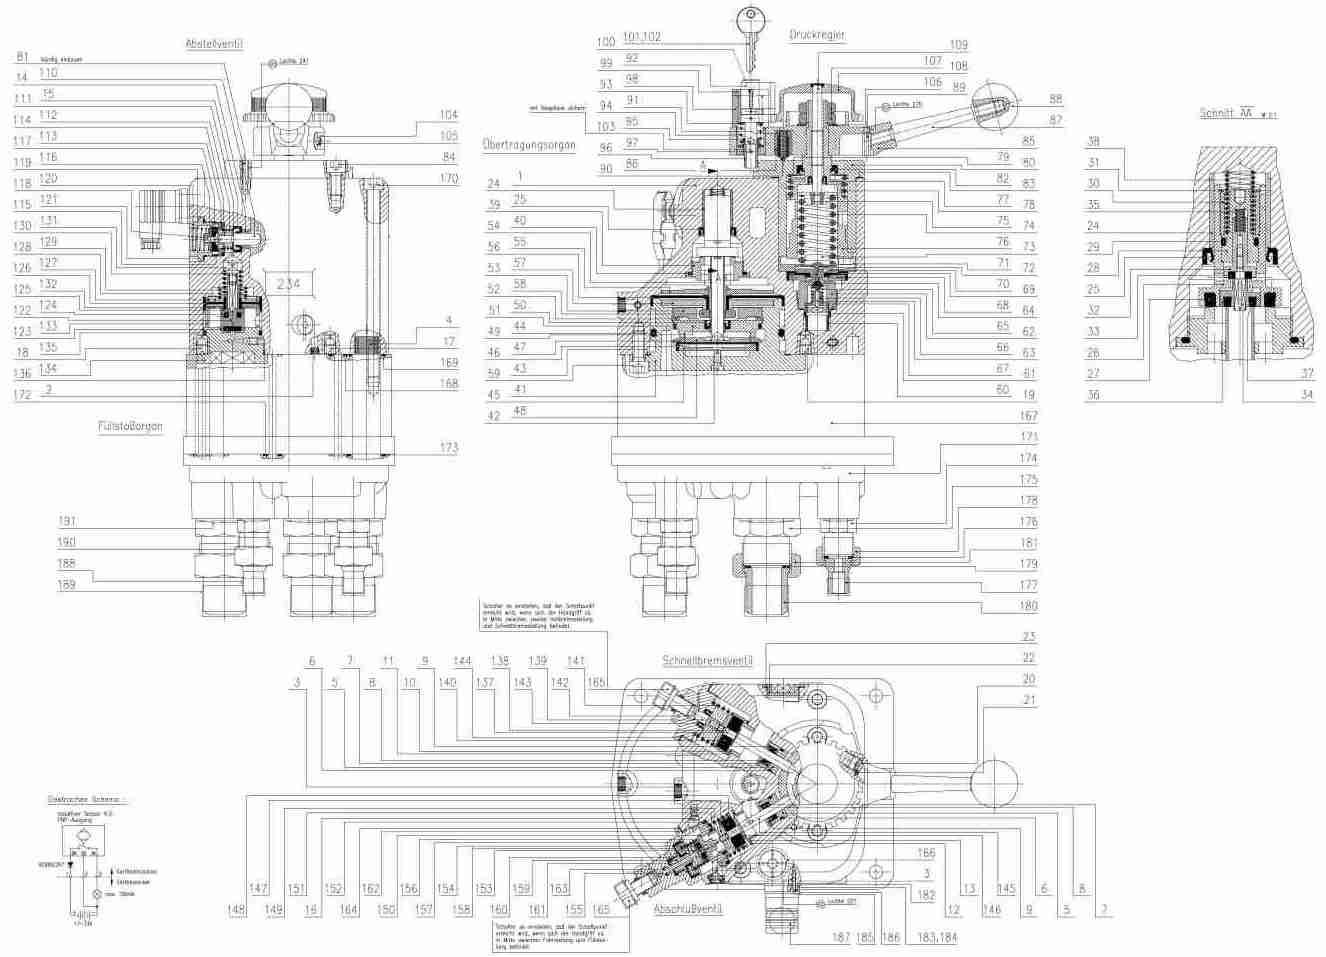 Ersatzteilstuckliste Fur Fuhrerbremsventil Ohne Anschlusse Fv 48 B Normblatt N 001 027 Zur